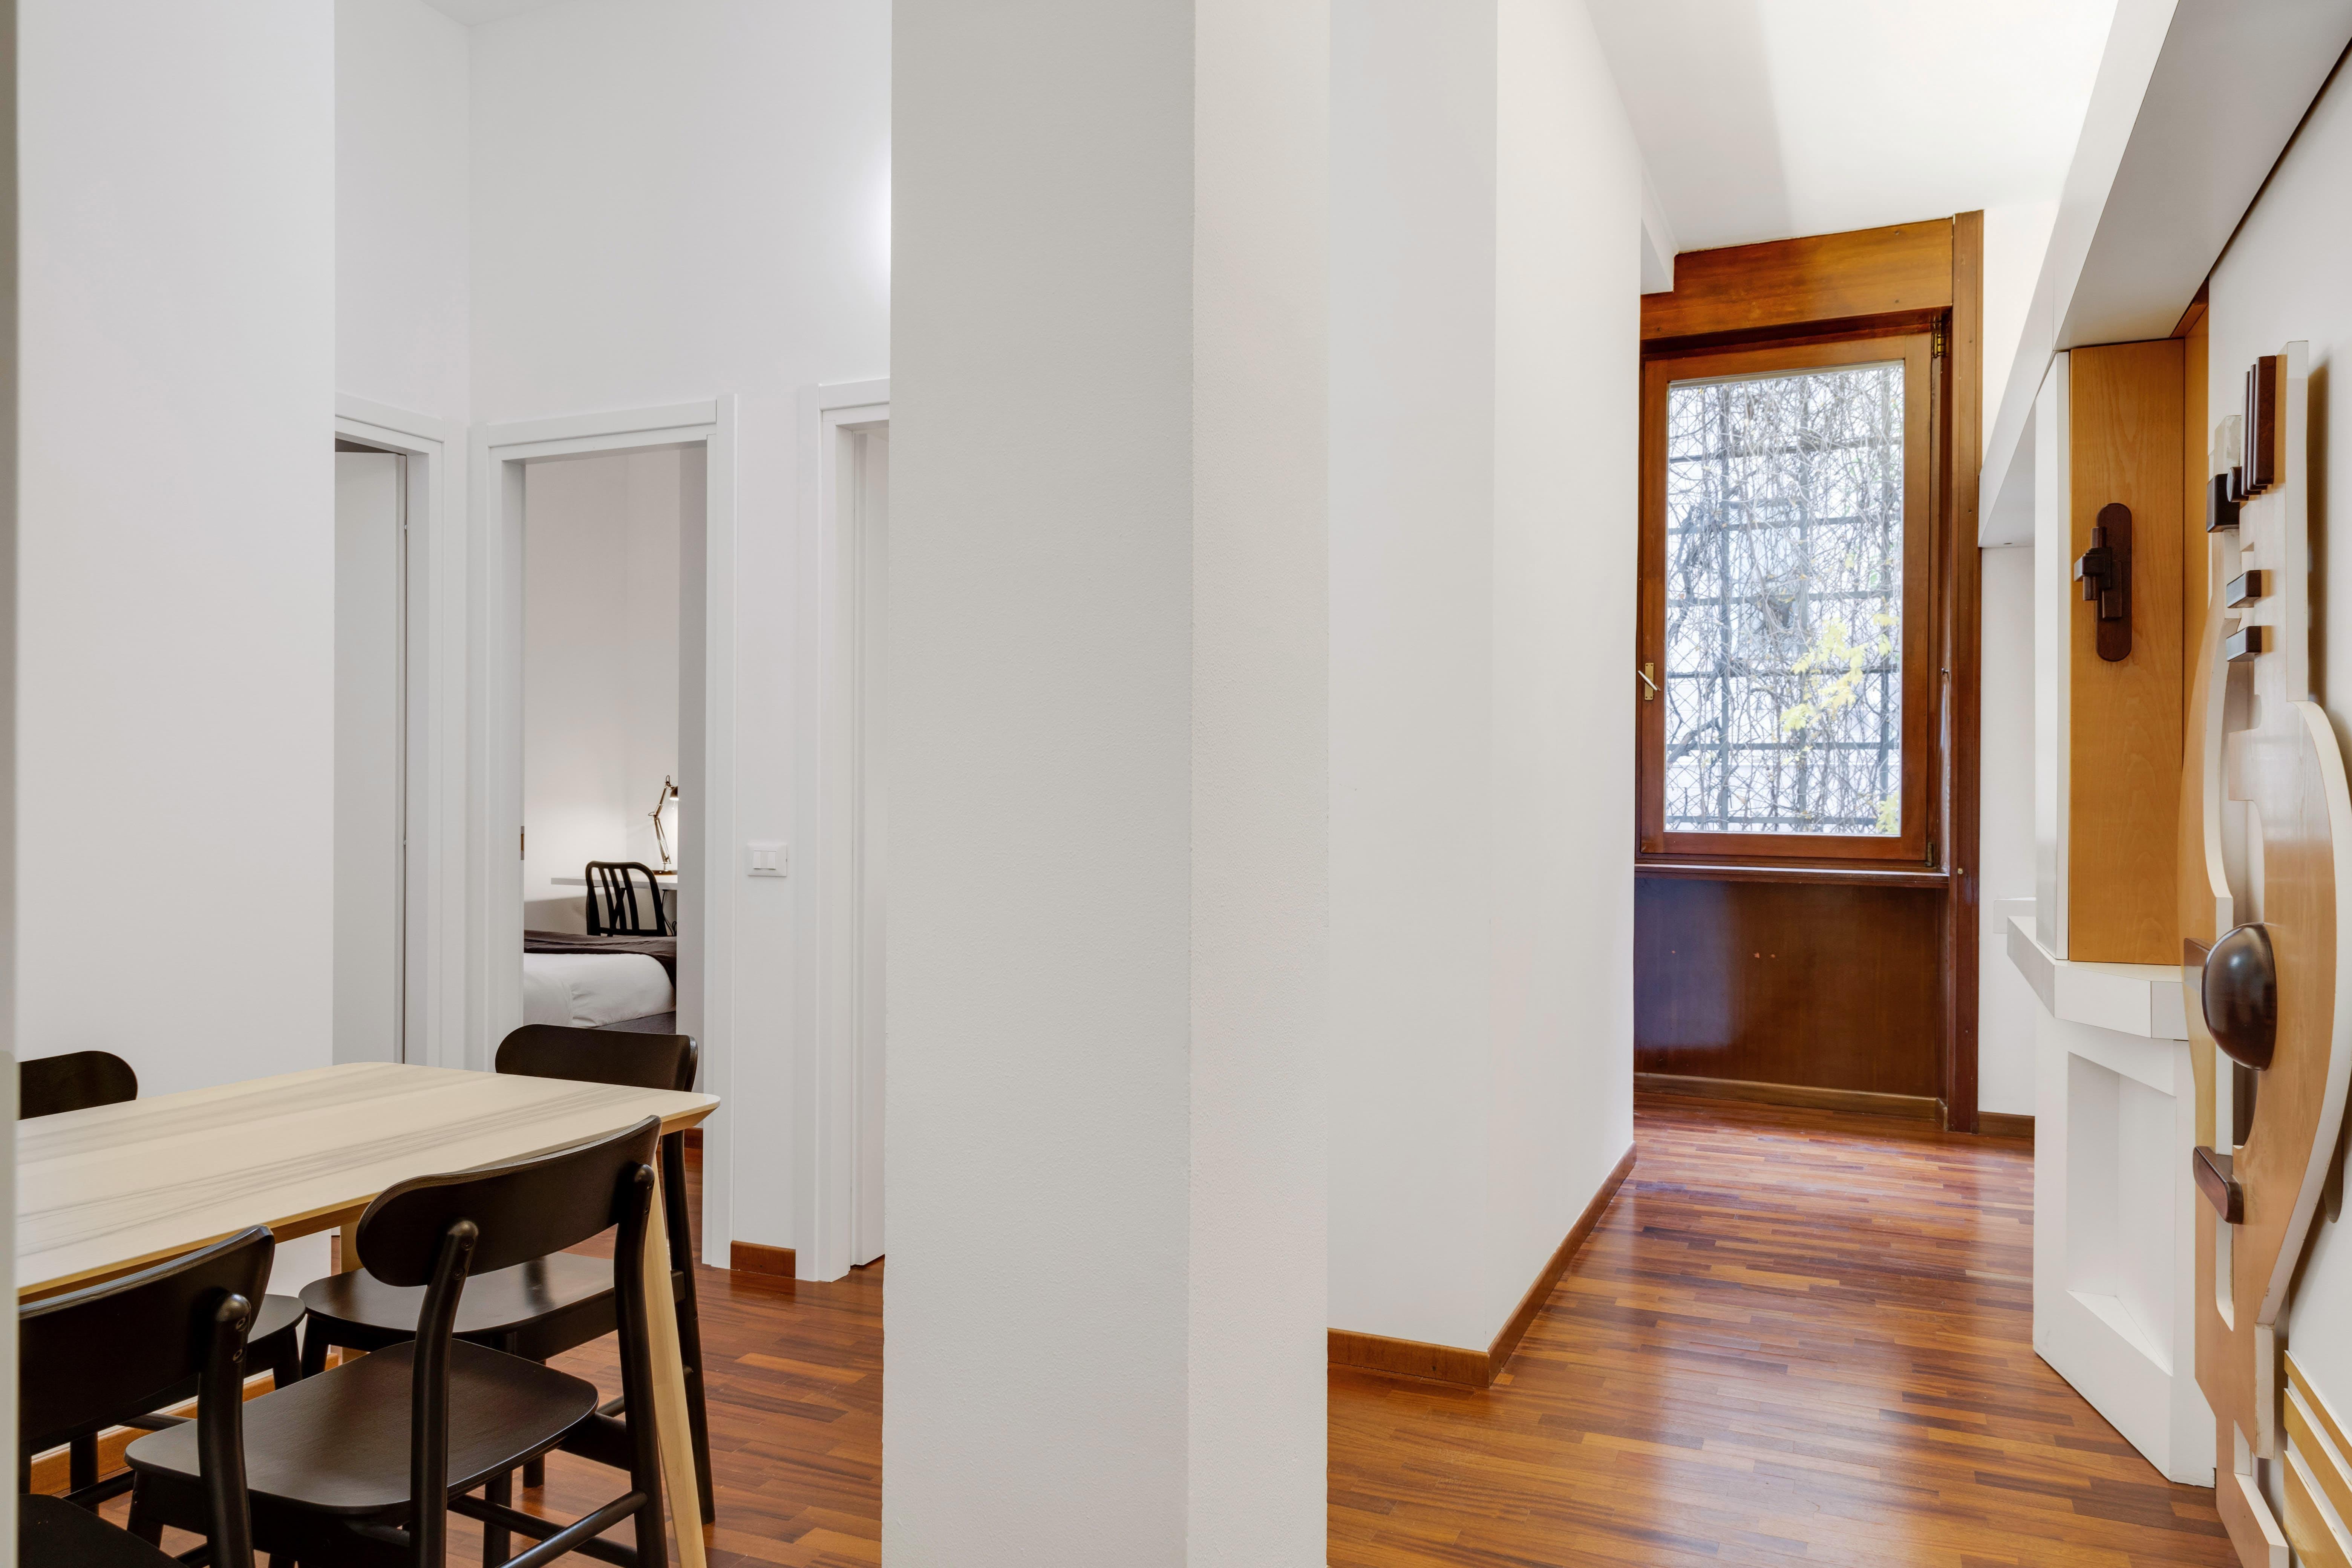 8 Residents | Borgonuovo - Montenapoleone | Newly Refurbished Apt. w/ Terrace